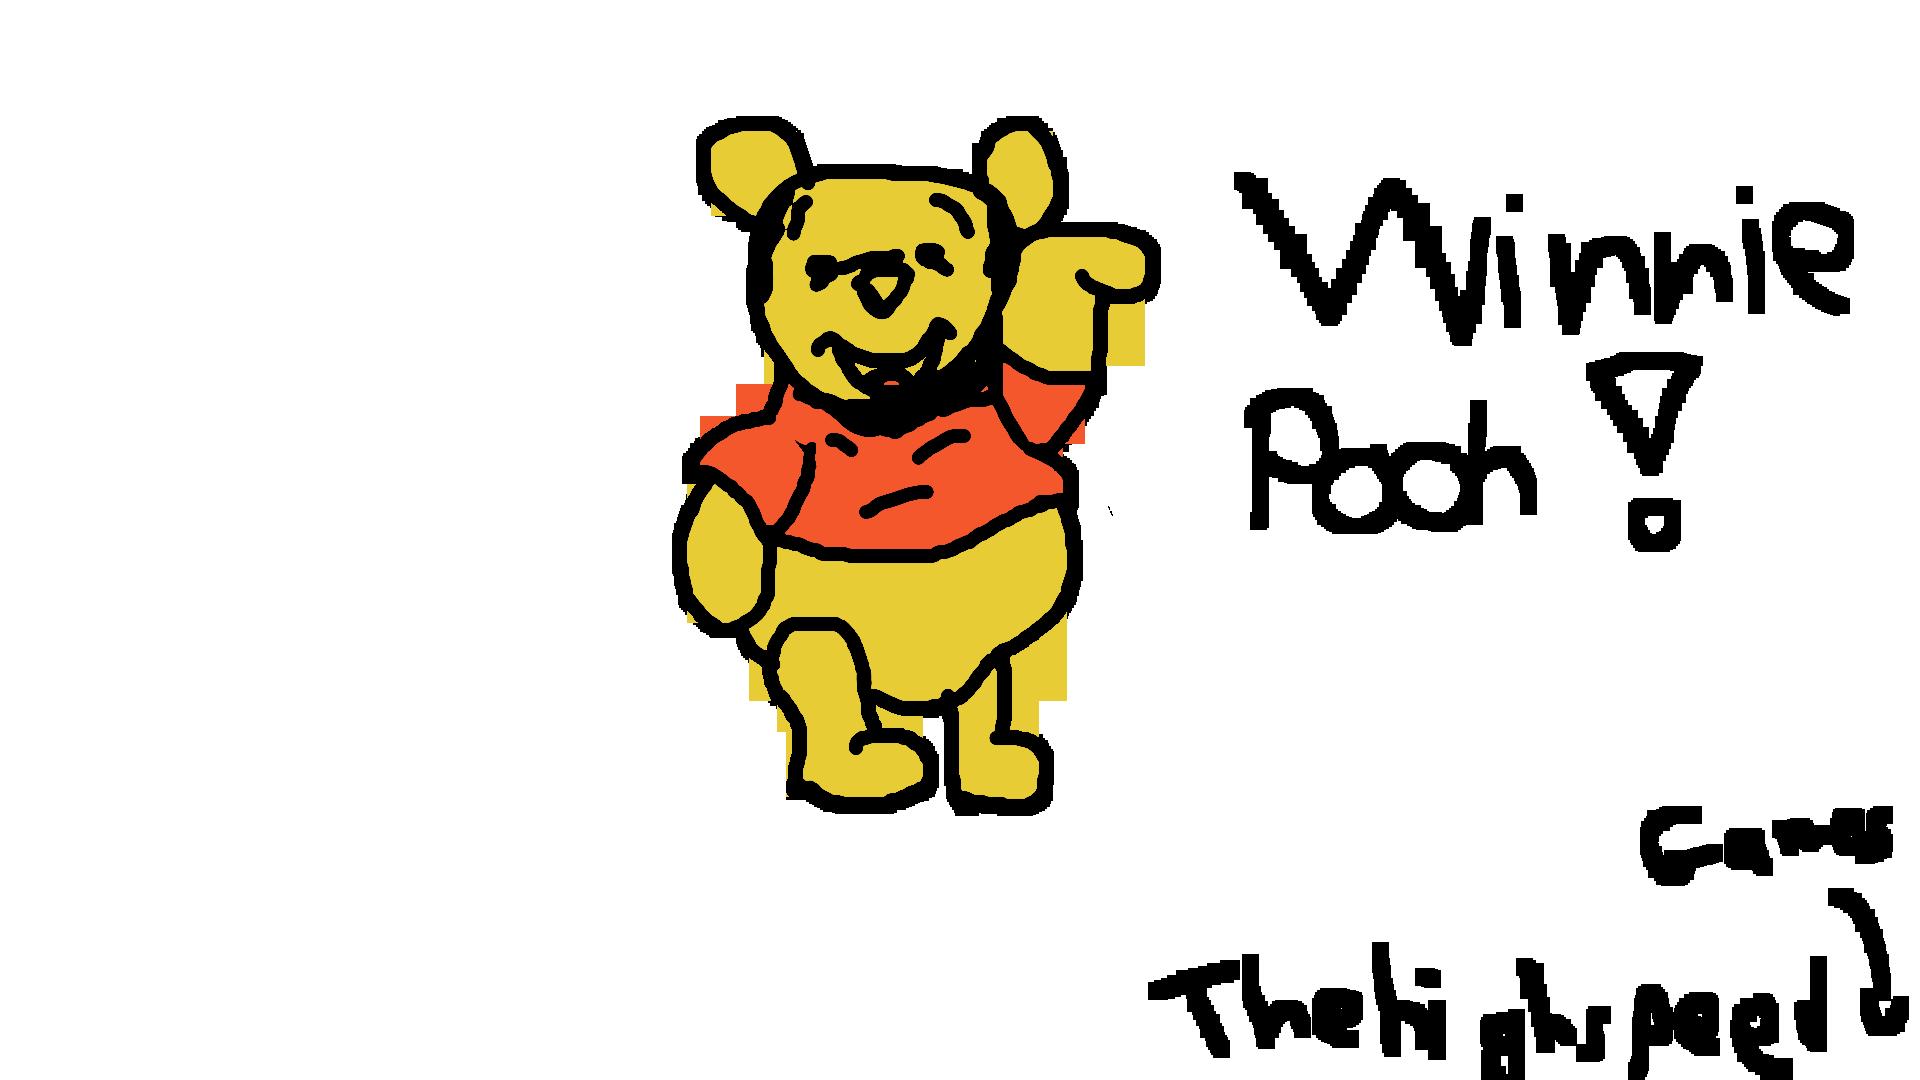 Winnie Pooh - Shitty Art #1